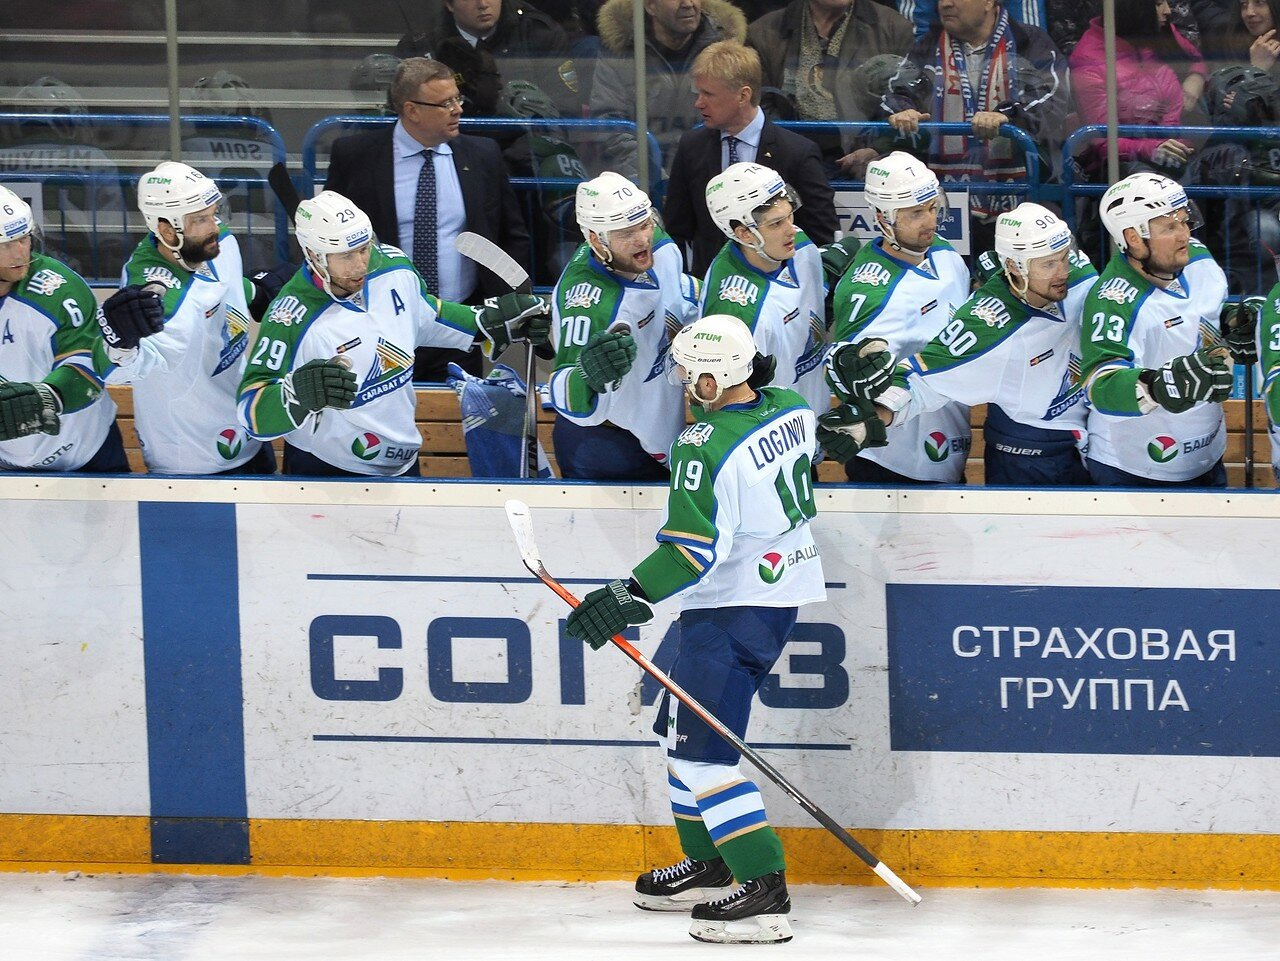 124Плей-офф 2016 Восток Финал Металлург - Салават Юлаев 23.03.2016